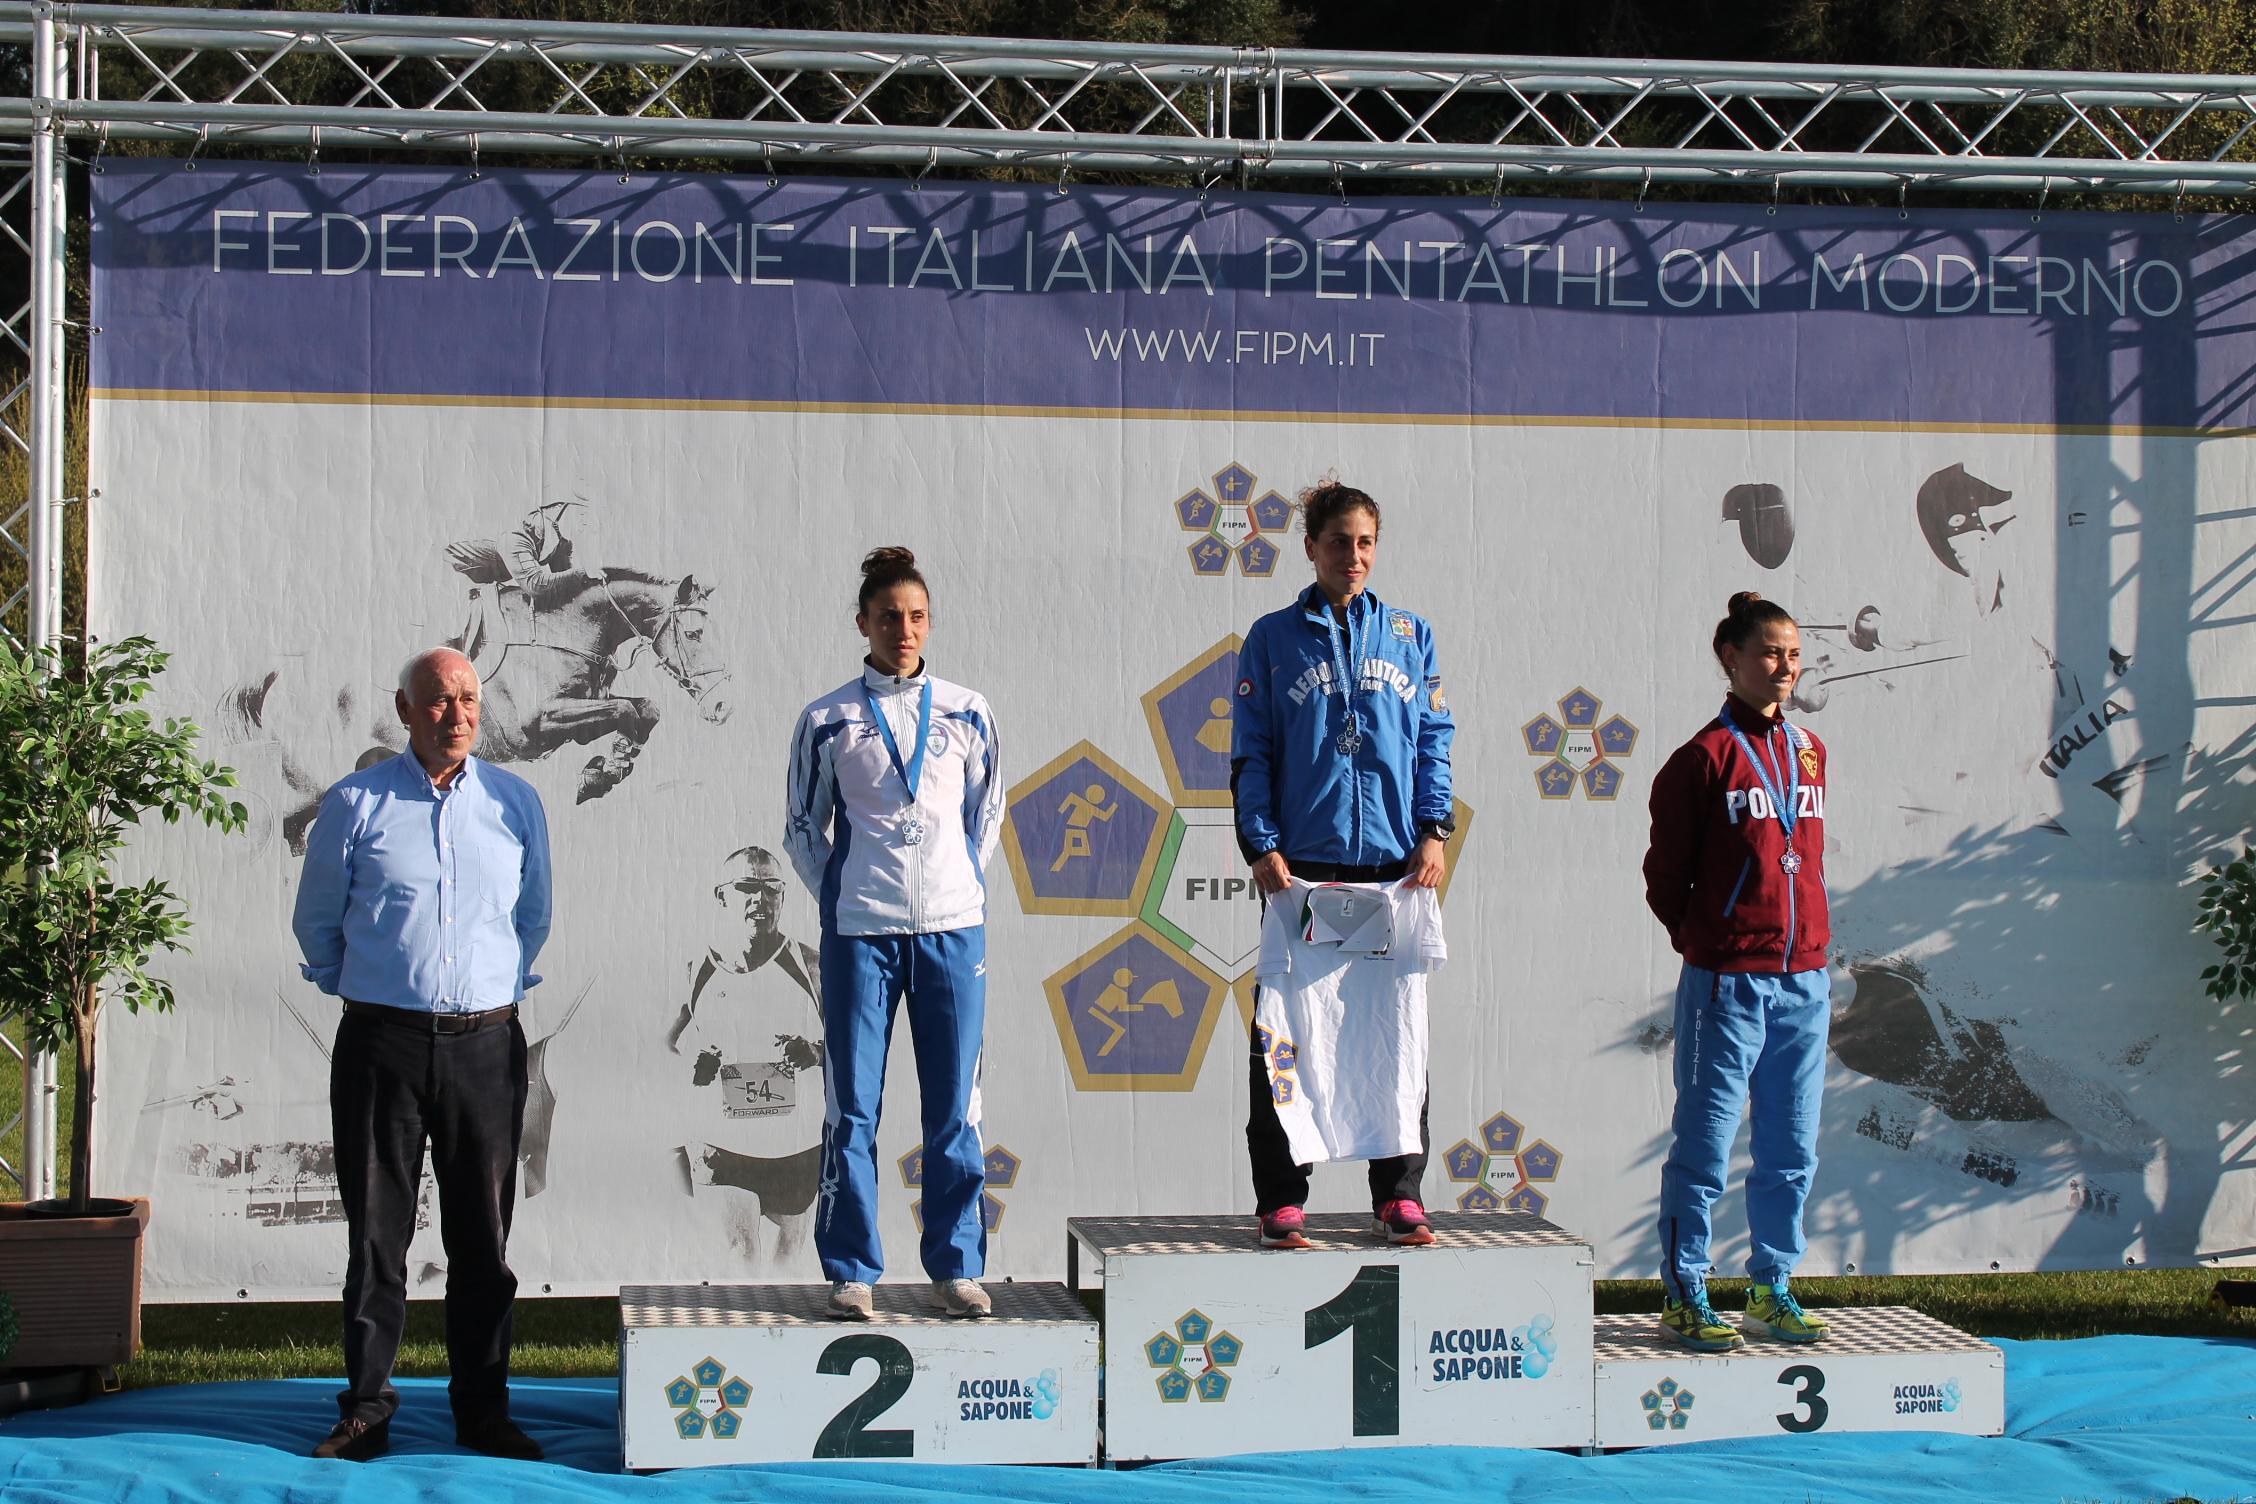 pentathlon campionati italiani 2019 alessandra frezza alice sotero irene prampolini italia italy pentathlon moderno roma